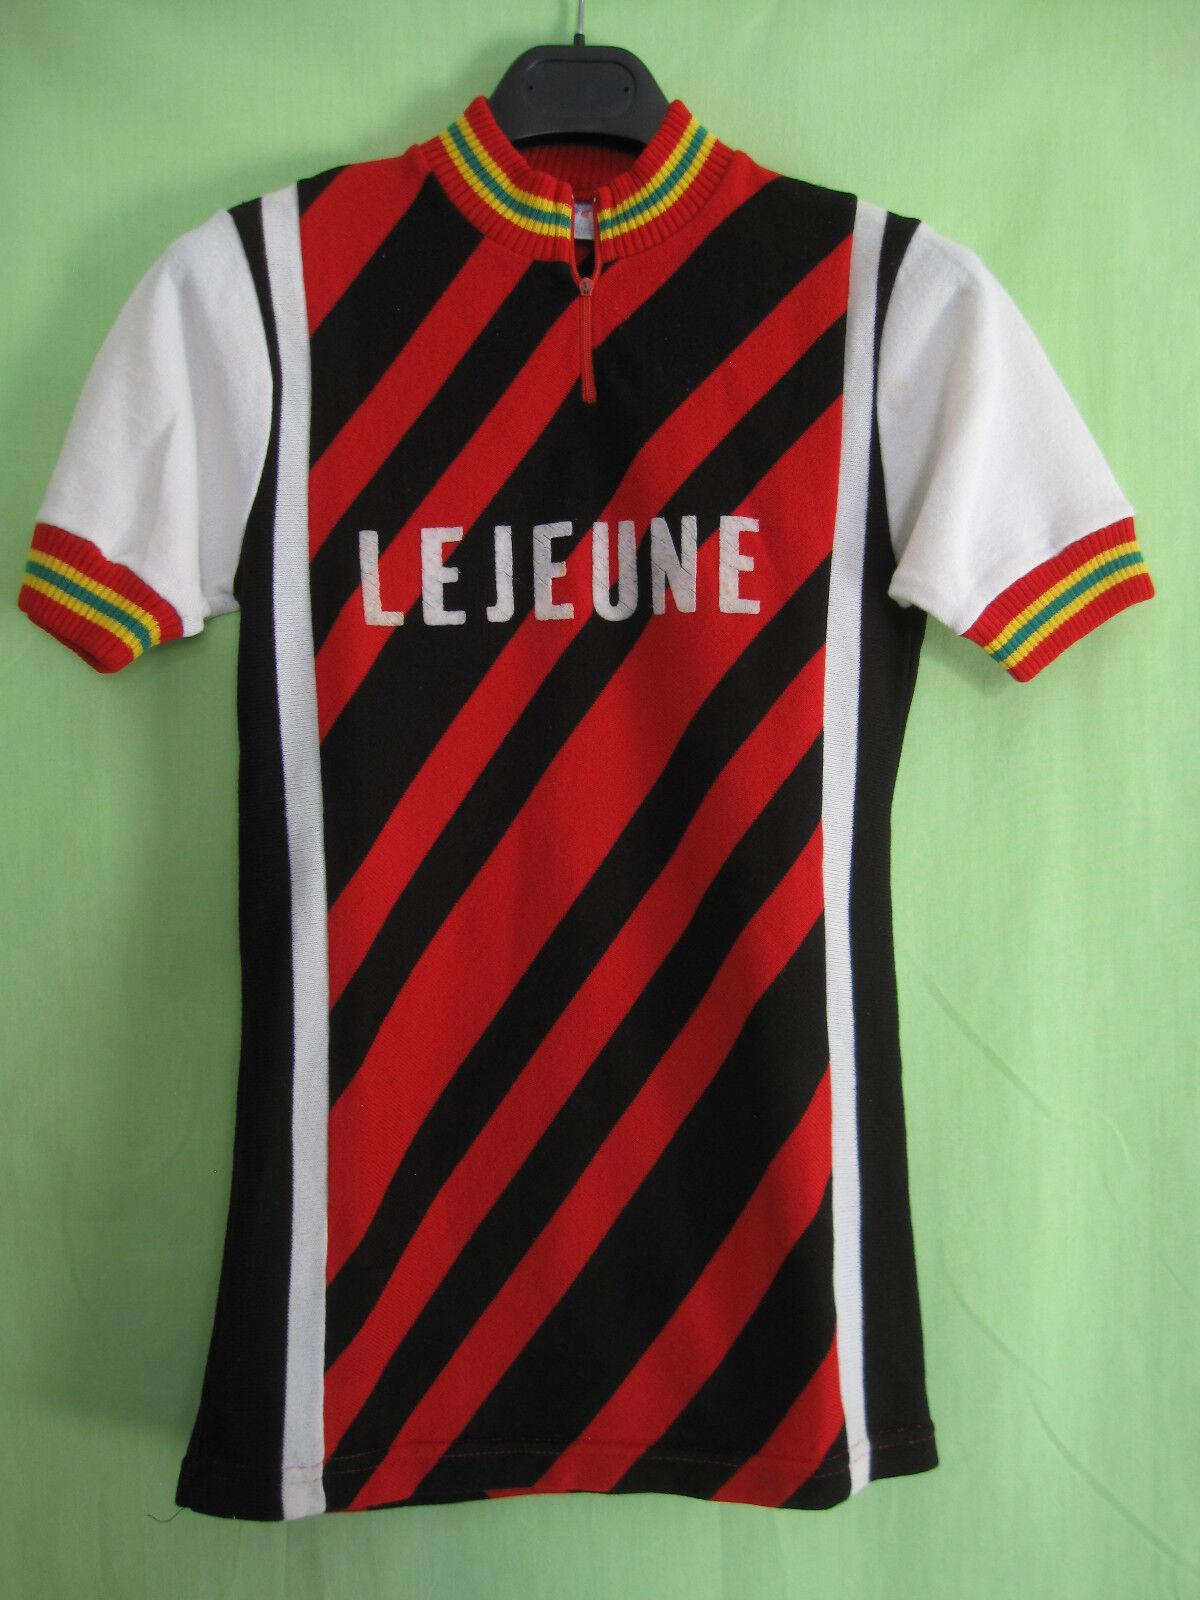 Maillot Cycliste vintage Lejeune Cycles Acrylique 70'S Jersey Velo - 2   S